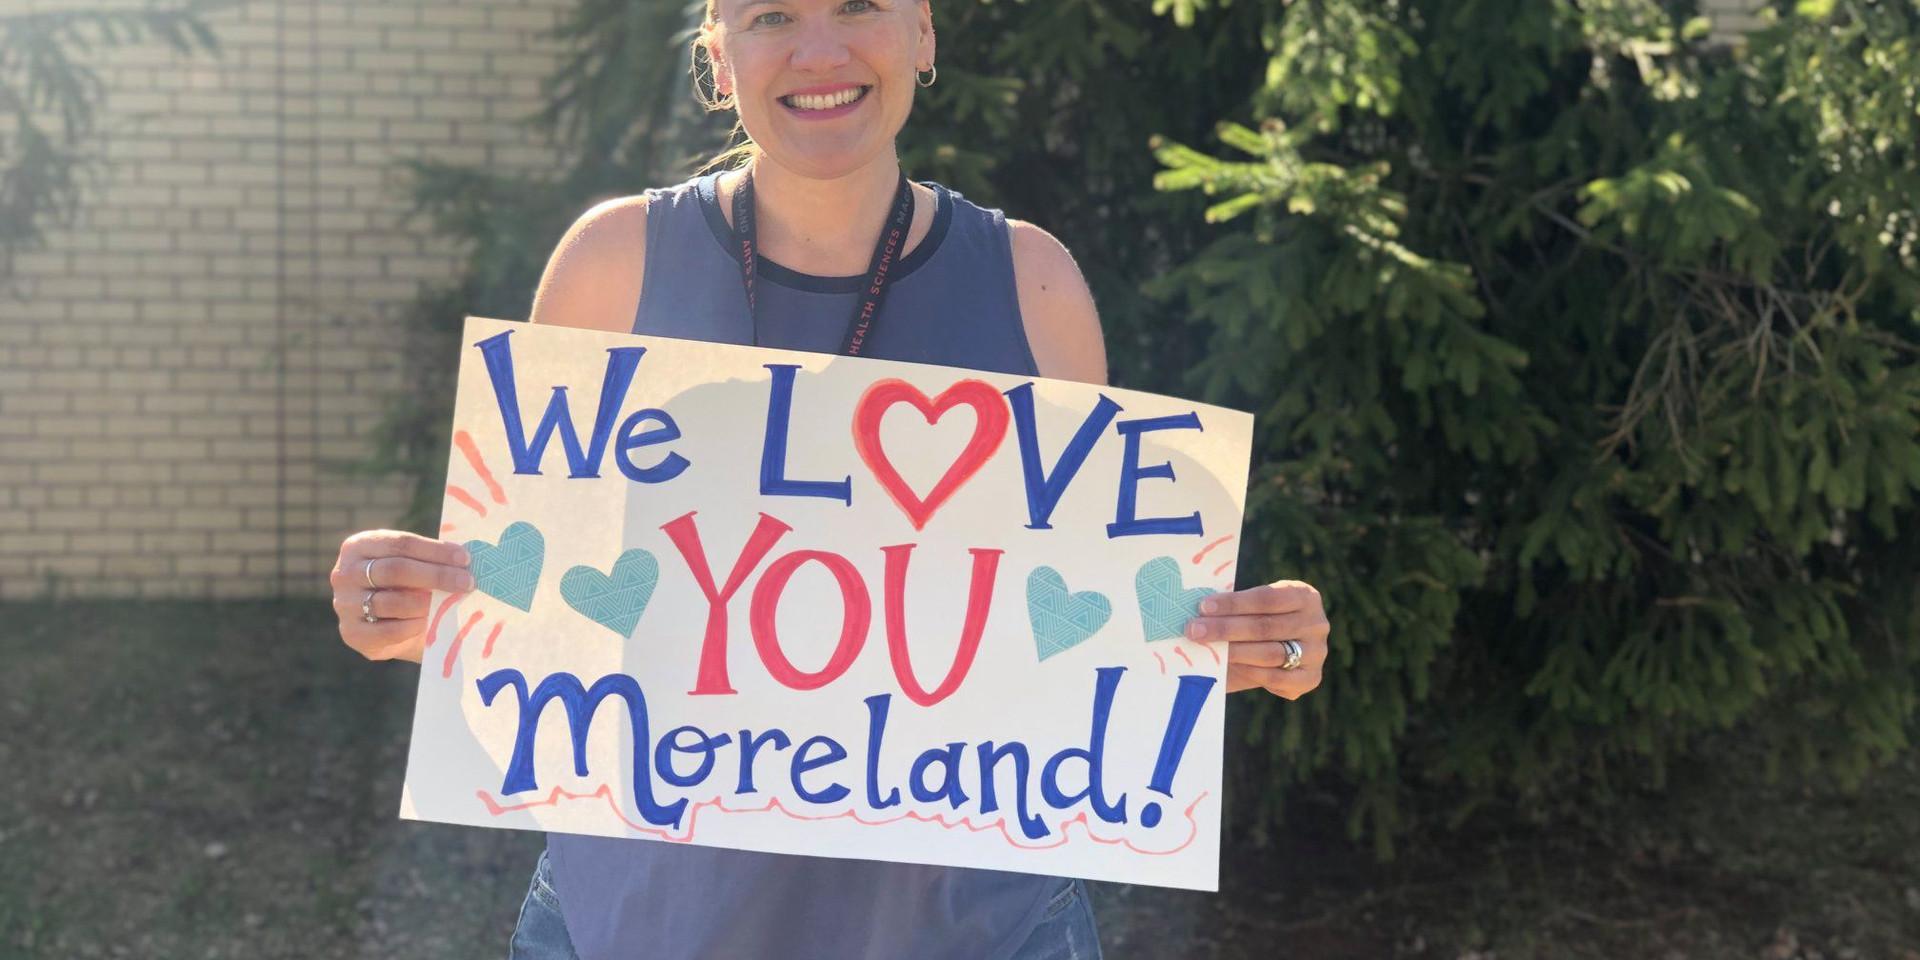 Love You Moreland.jpg